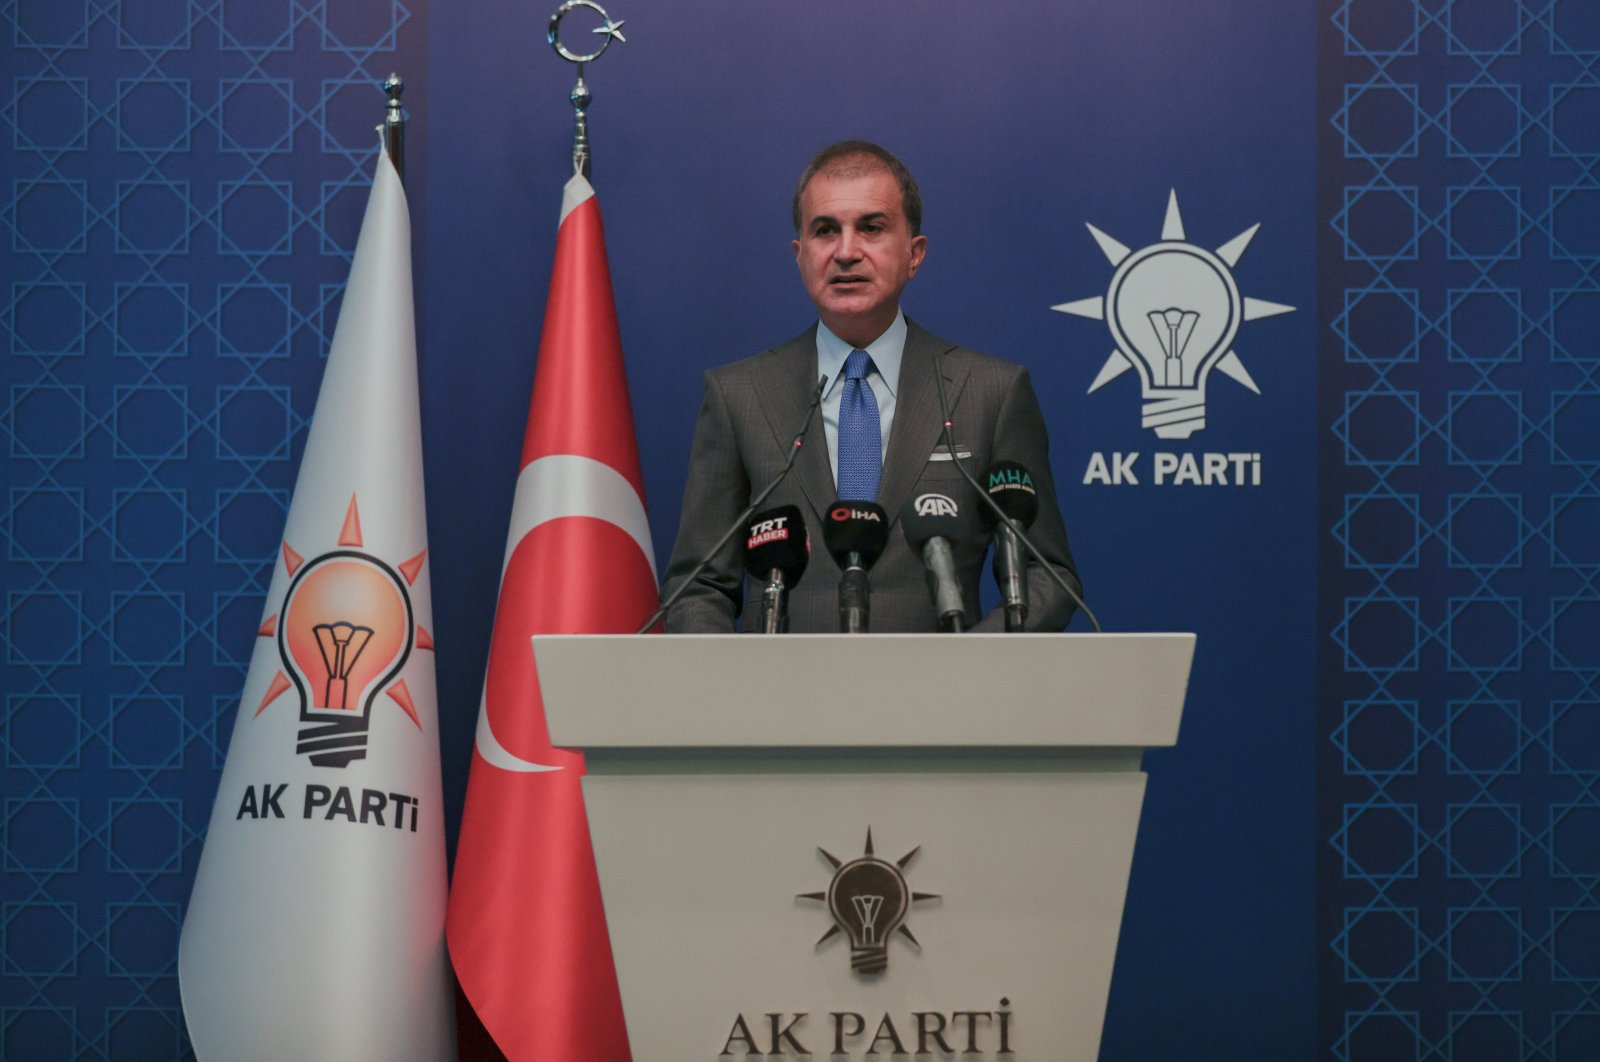 AK Party Spokesperson Ömer Çelik speaks at a news conference at party headquarters in Turkey's capital Ankara, July 14, 2021. (AA Photo)